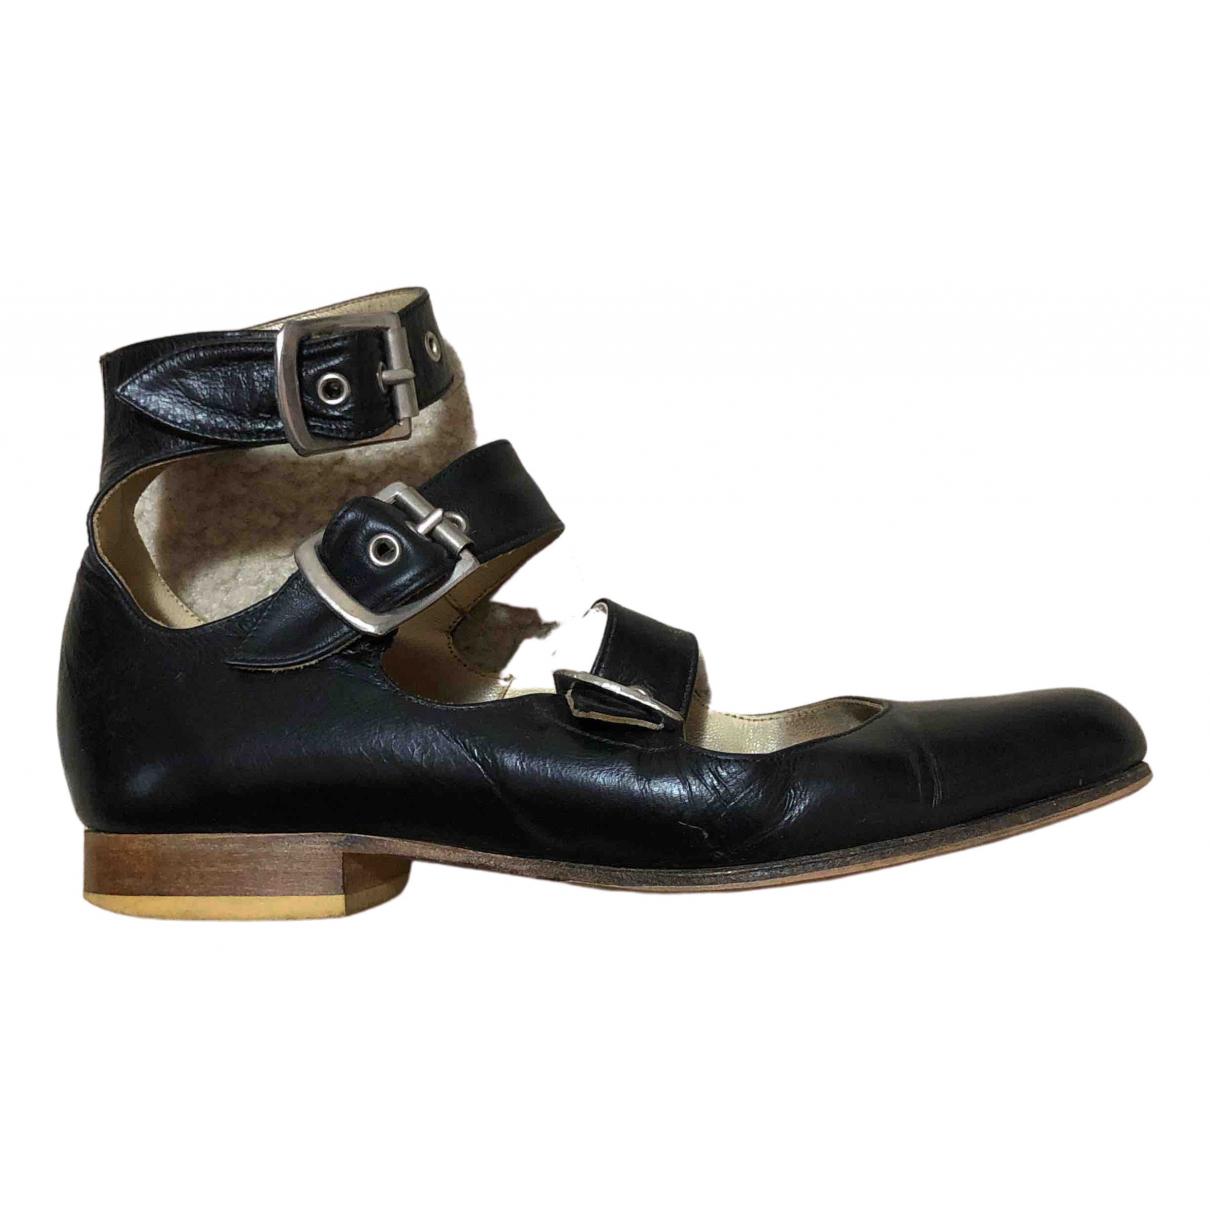 Vivienne Westwood \N Black Leather Sandals for Women 3 UK